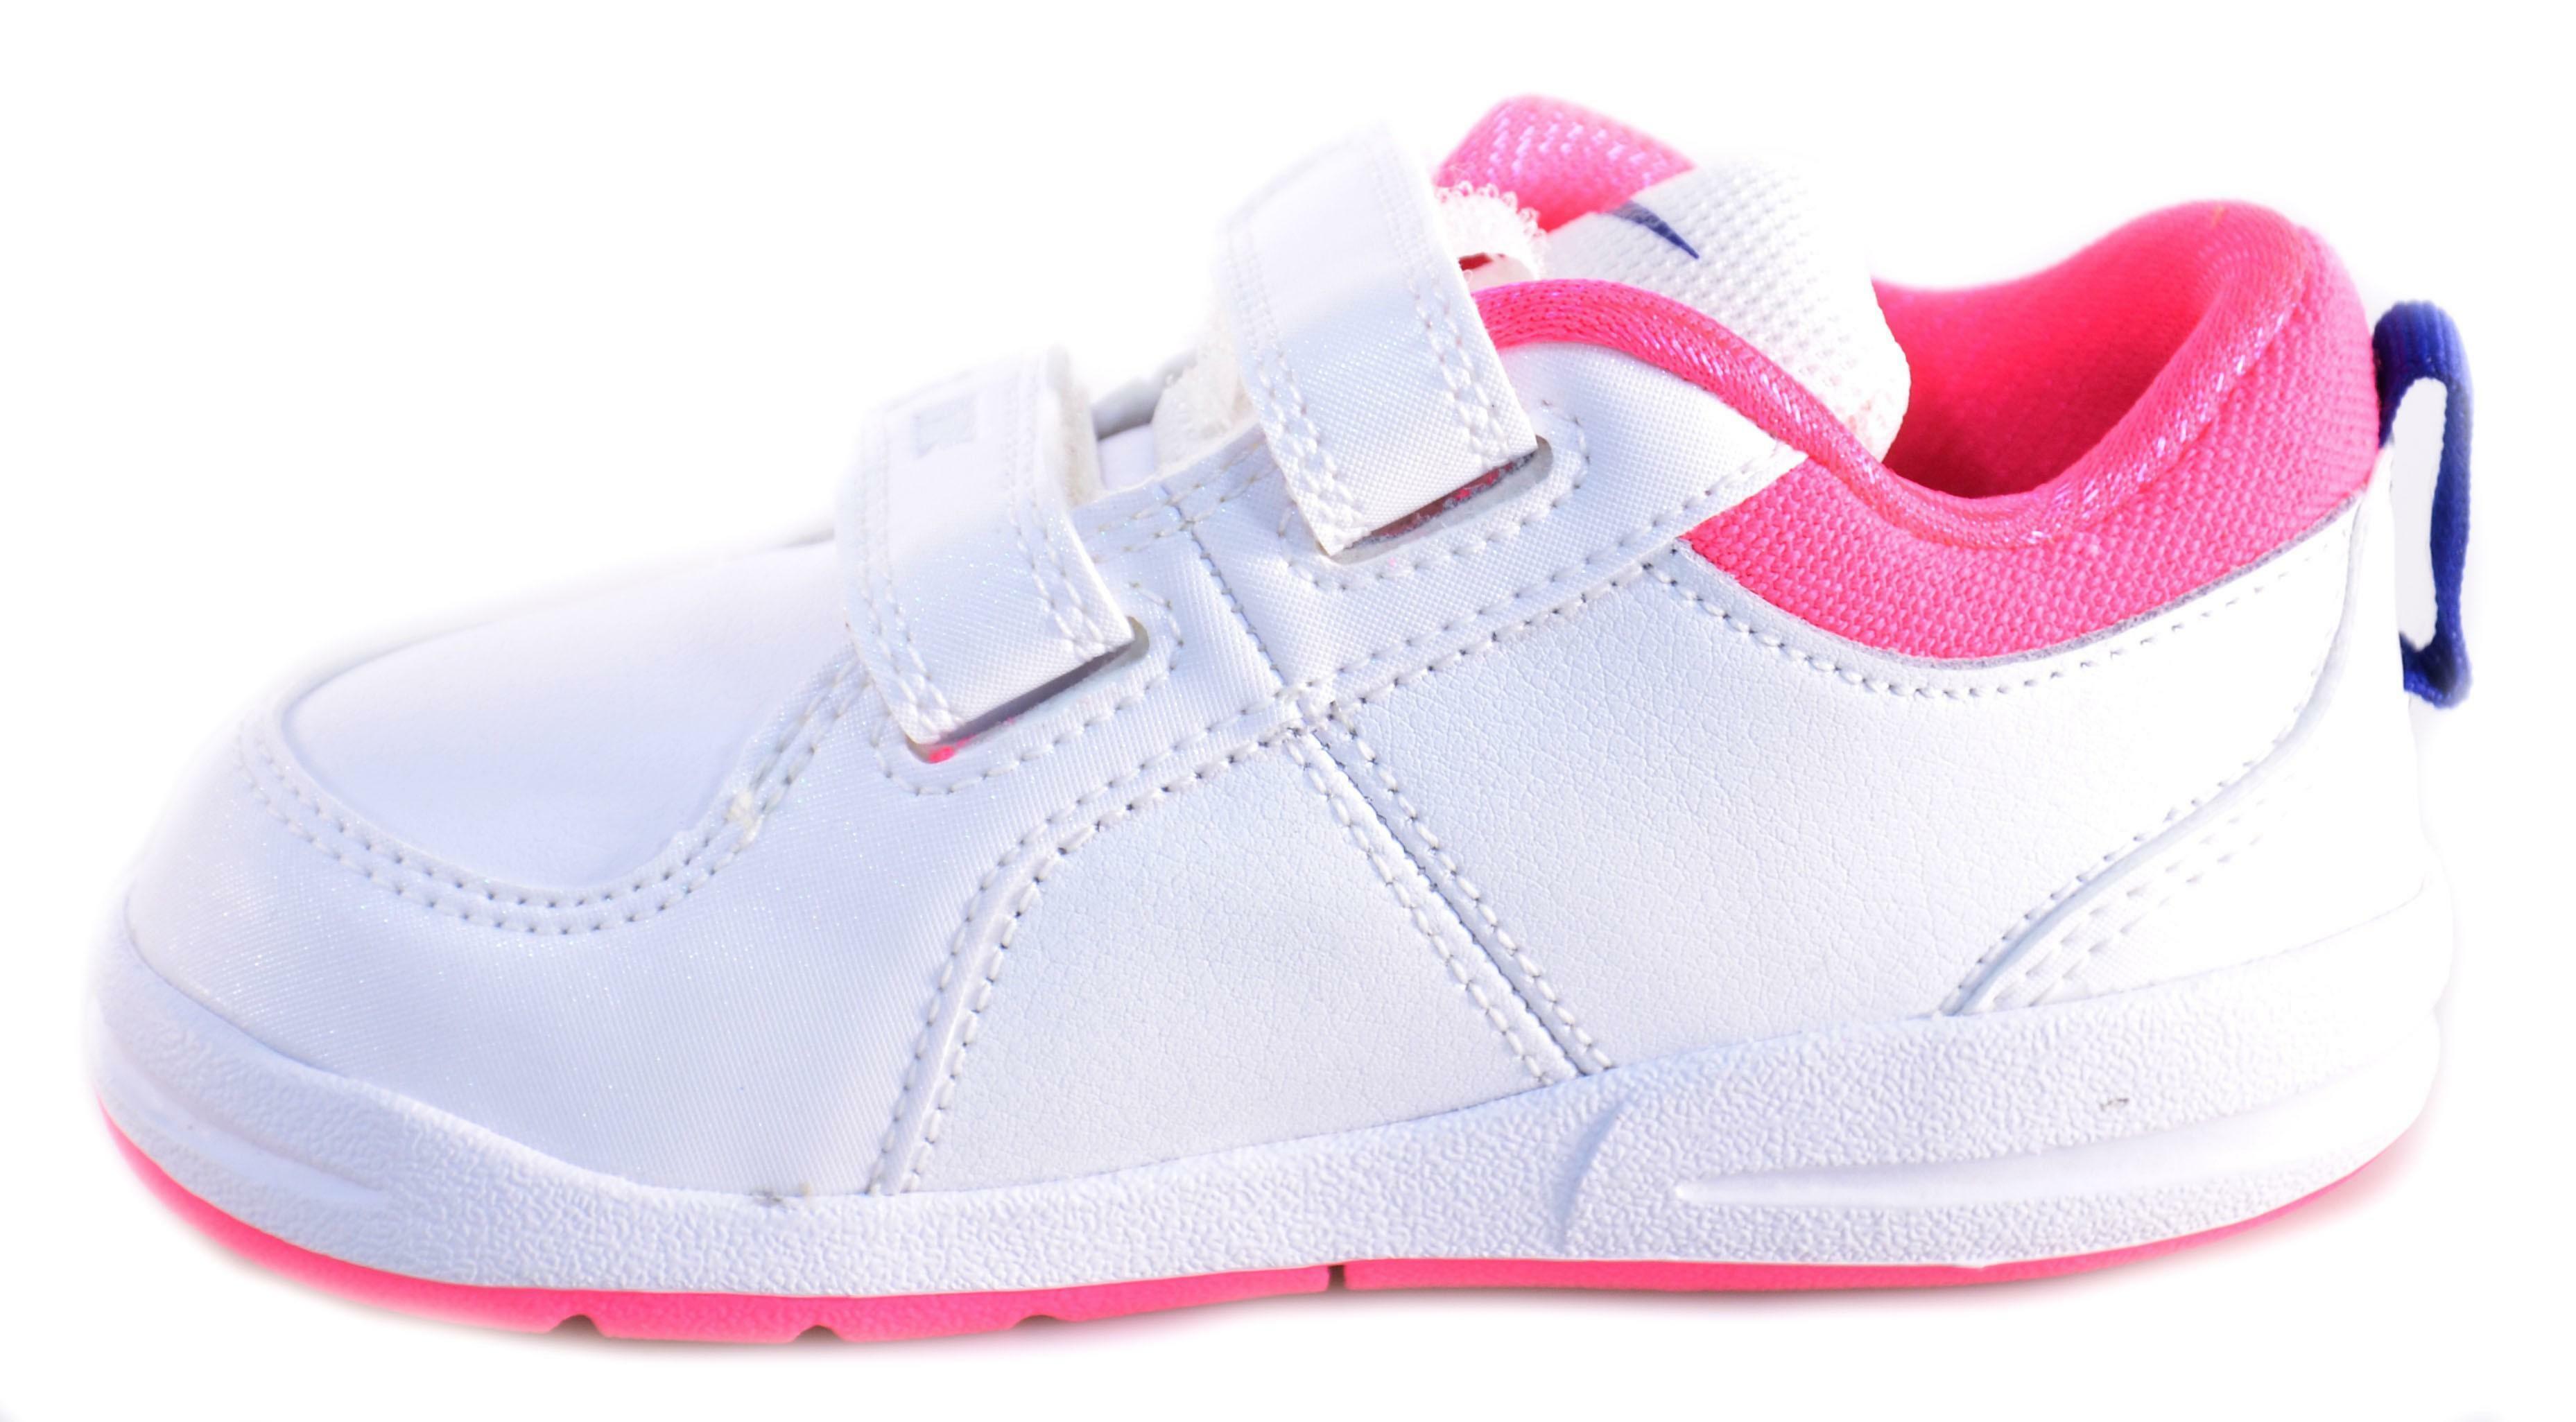 nike nike pico 4 (psv) scarpe bambina bianche blu rosa pelle velcro 454477